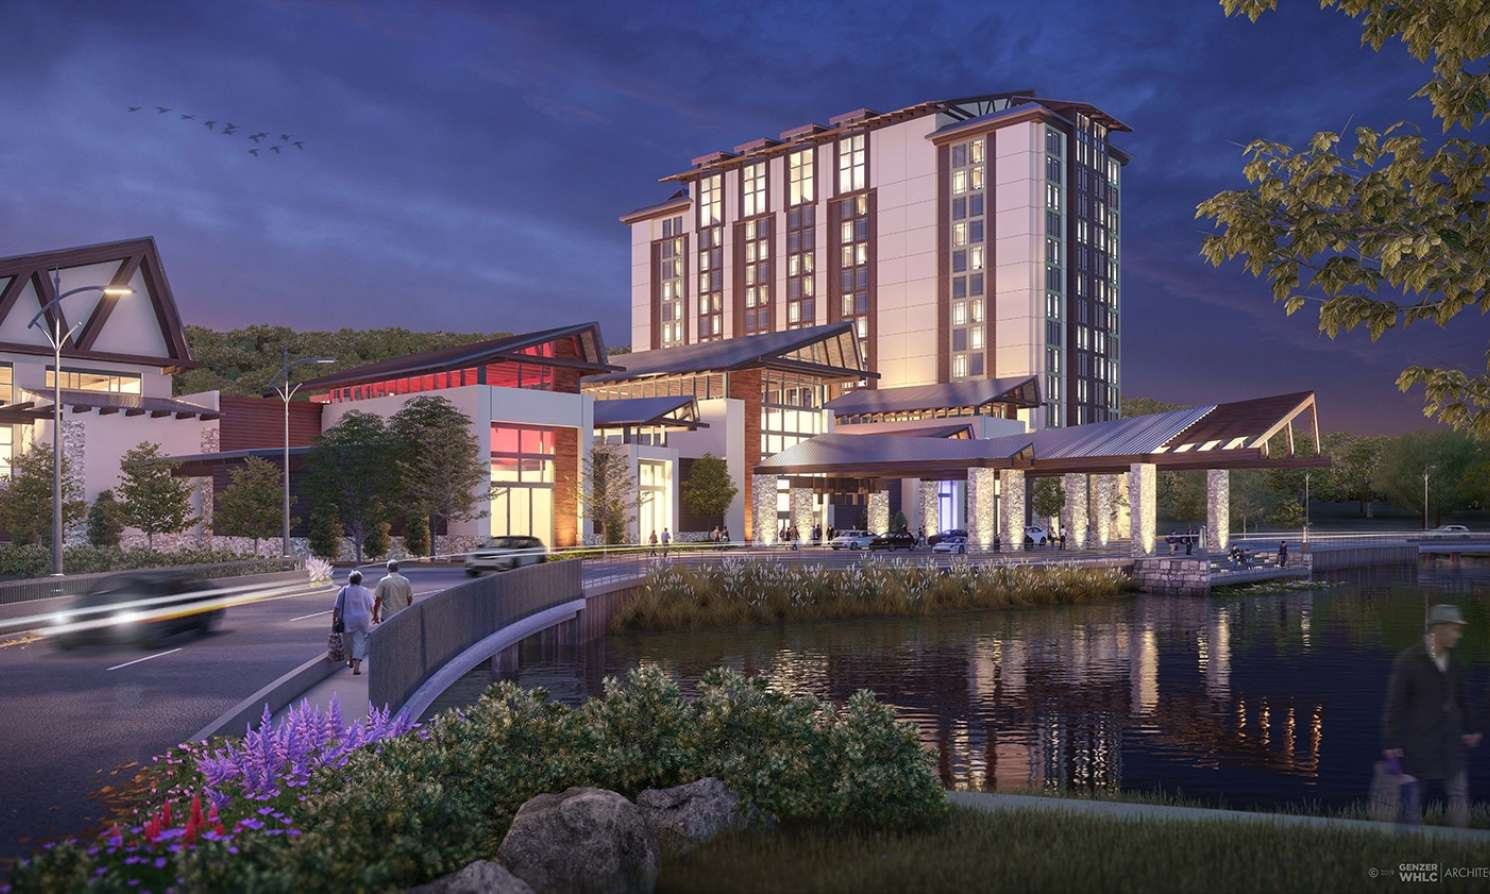 Arkansas Casino Hotel pr A v2n F r ws